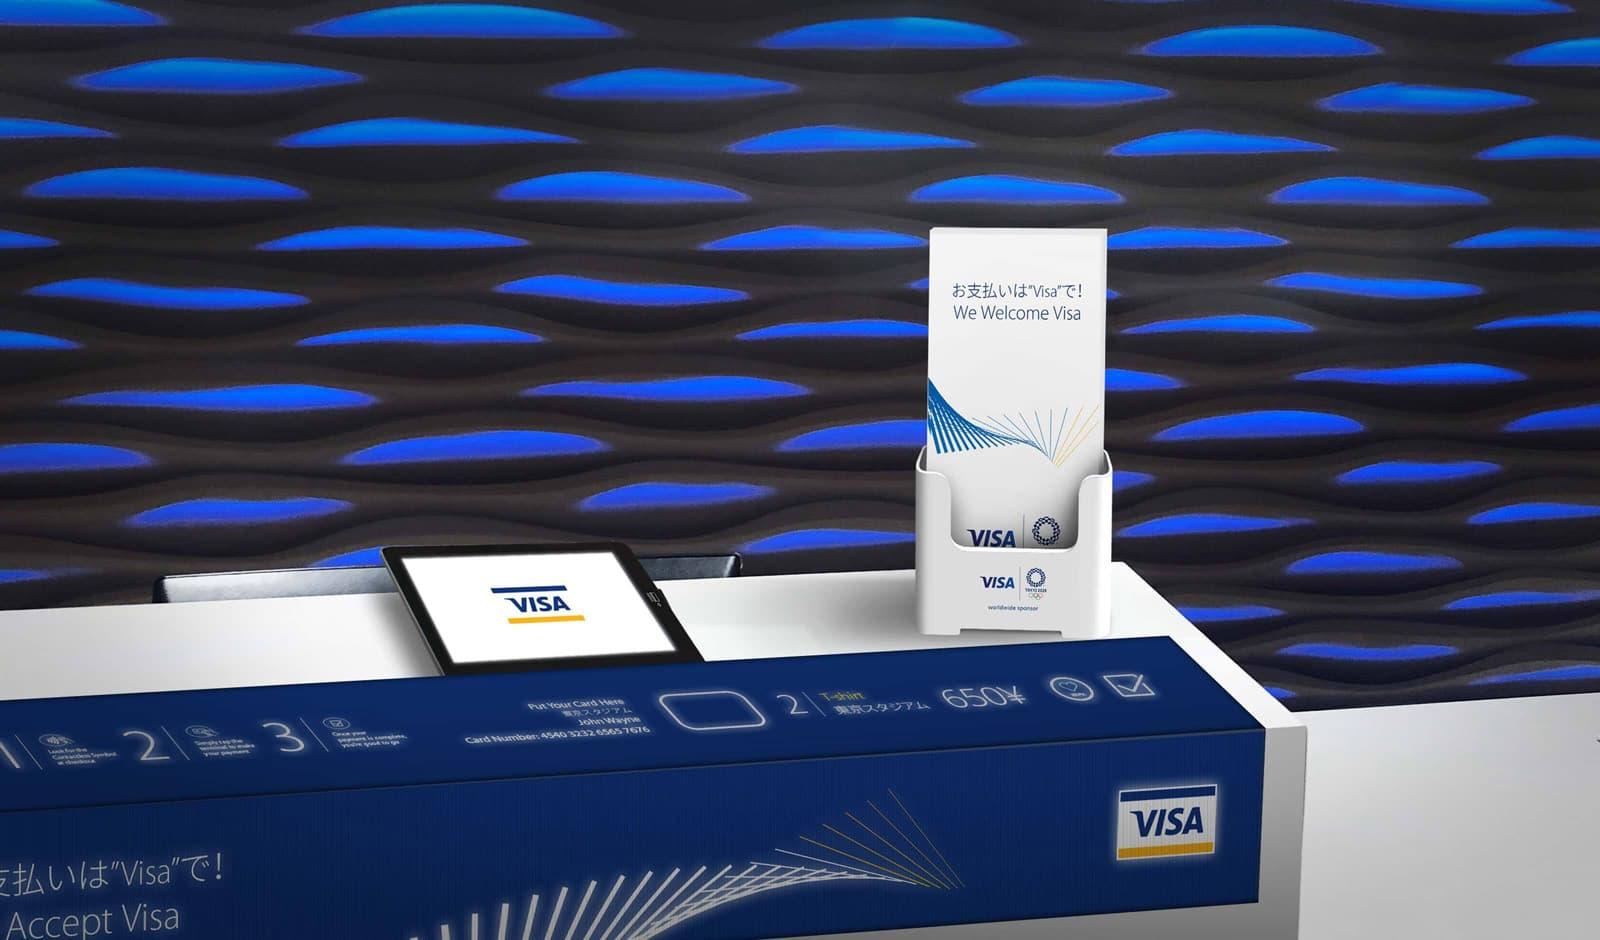 Visa Tokyo 2020 - Desk